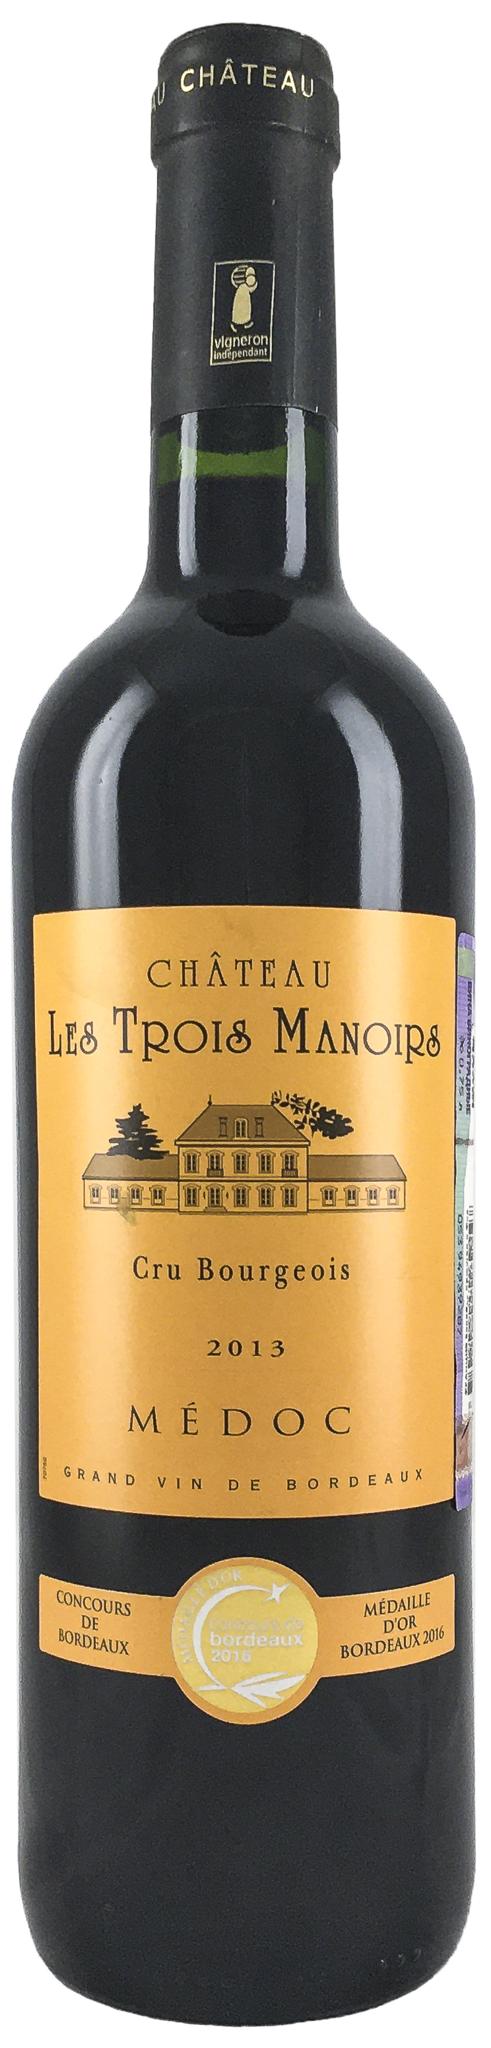 Вино Шато Ле Труа Мануар з.н.м.п. Бордо (AOC Medoc Cru Bourgeois) 2013г крас.сух. 0,75 л. Франция